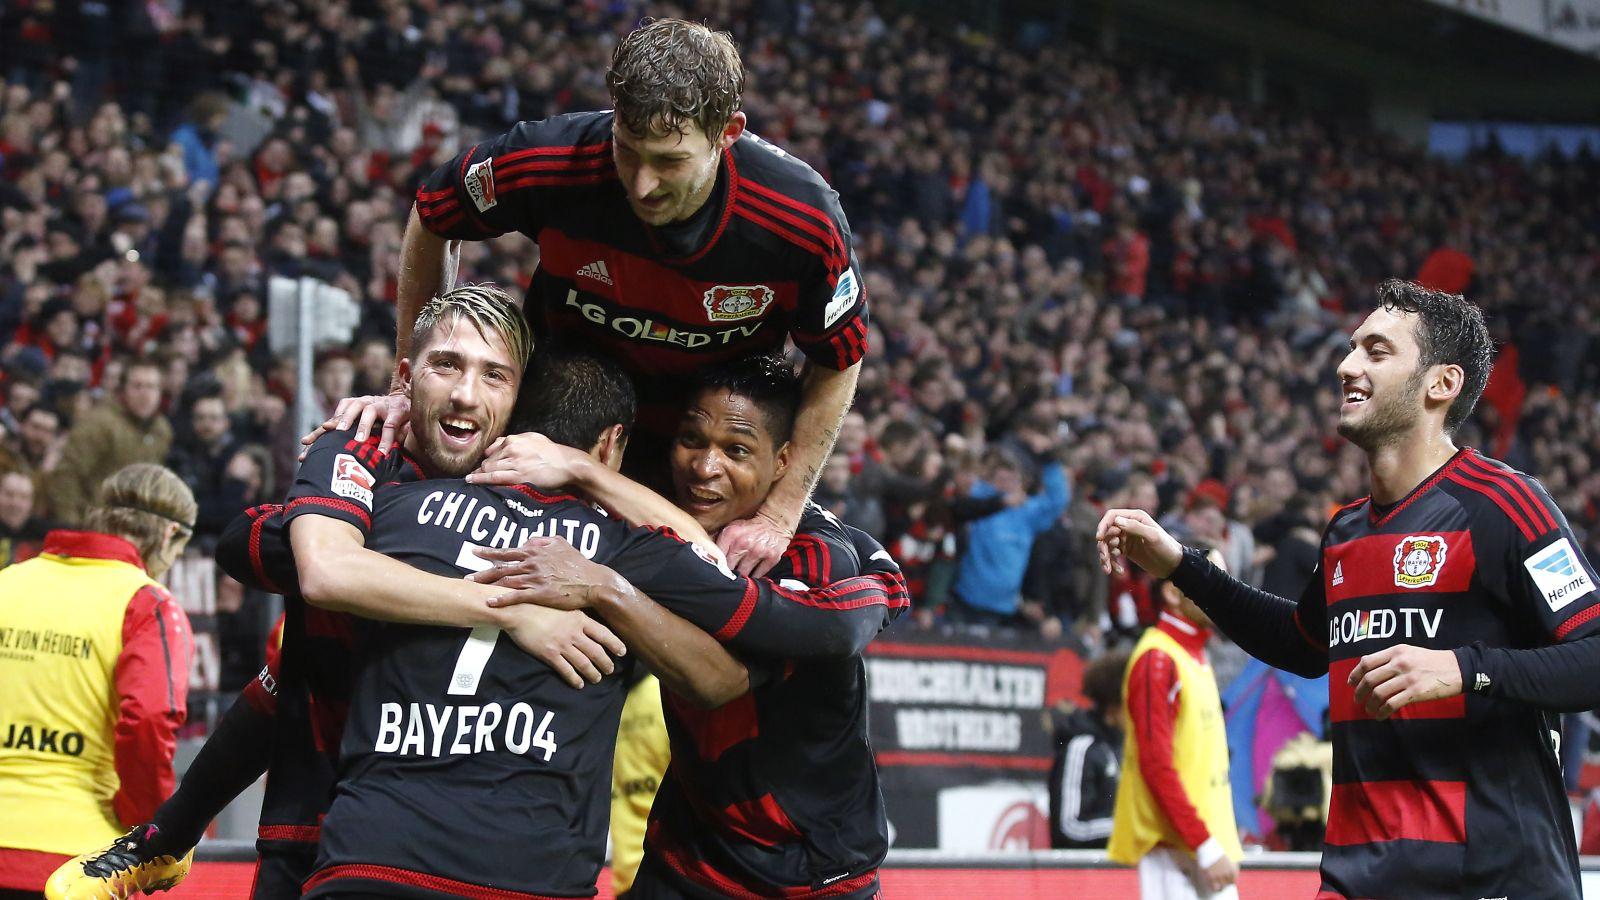 Leverkusen jump to third after comfy win over Frankfurt